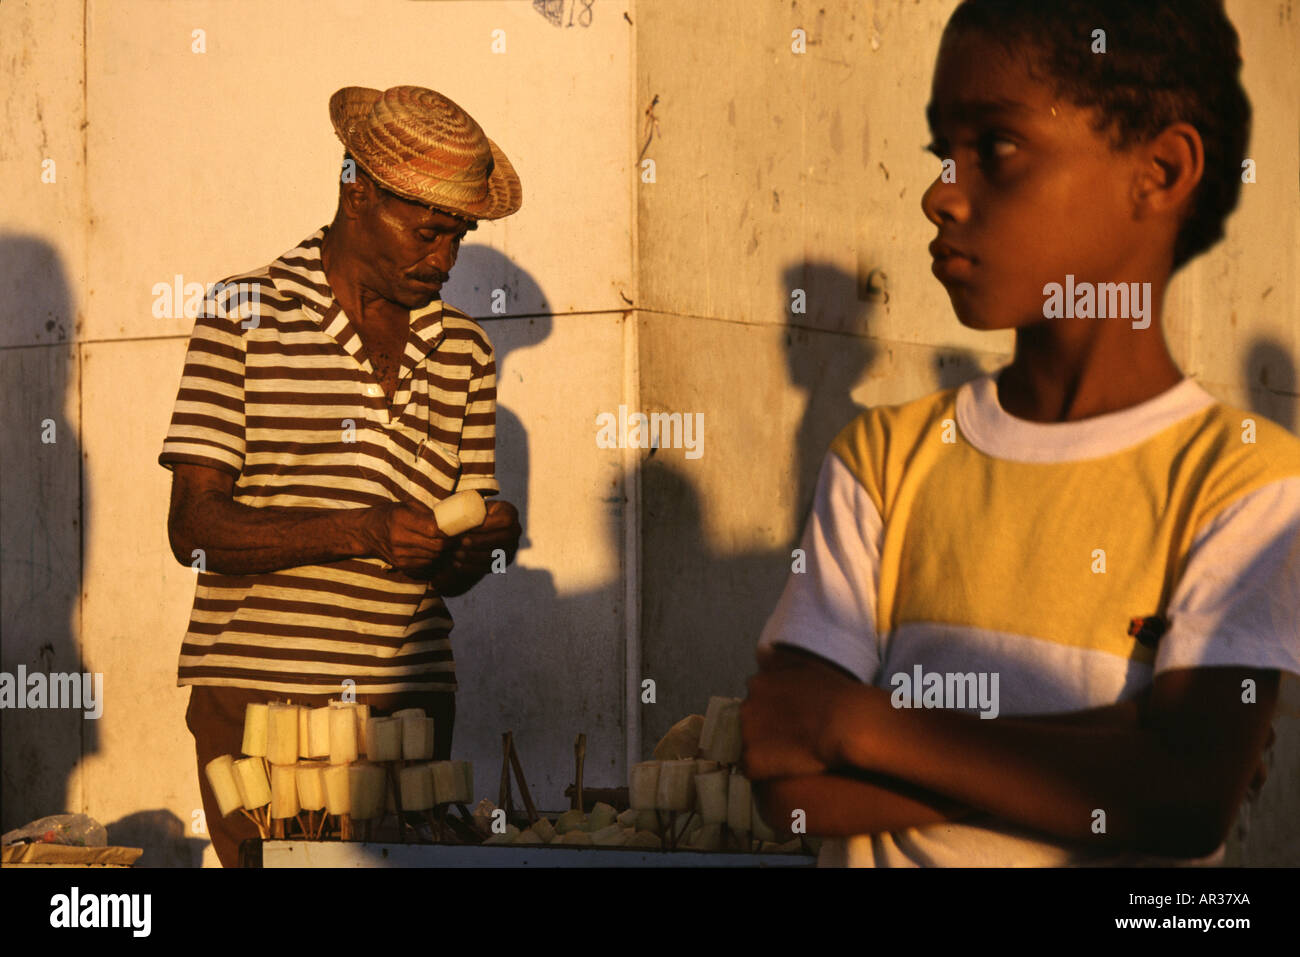 Sugarcane vendor in Rio, Rio de Janeiro, Brazil South America - Stock Image